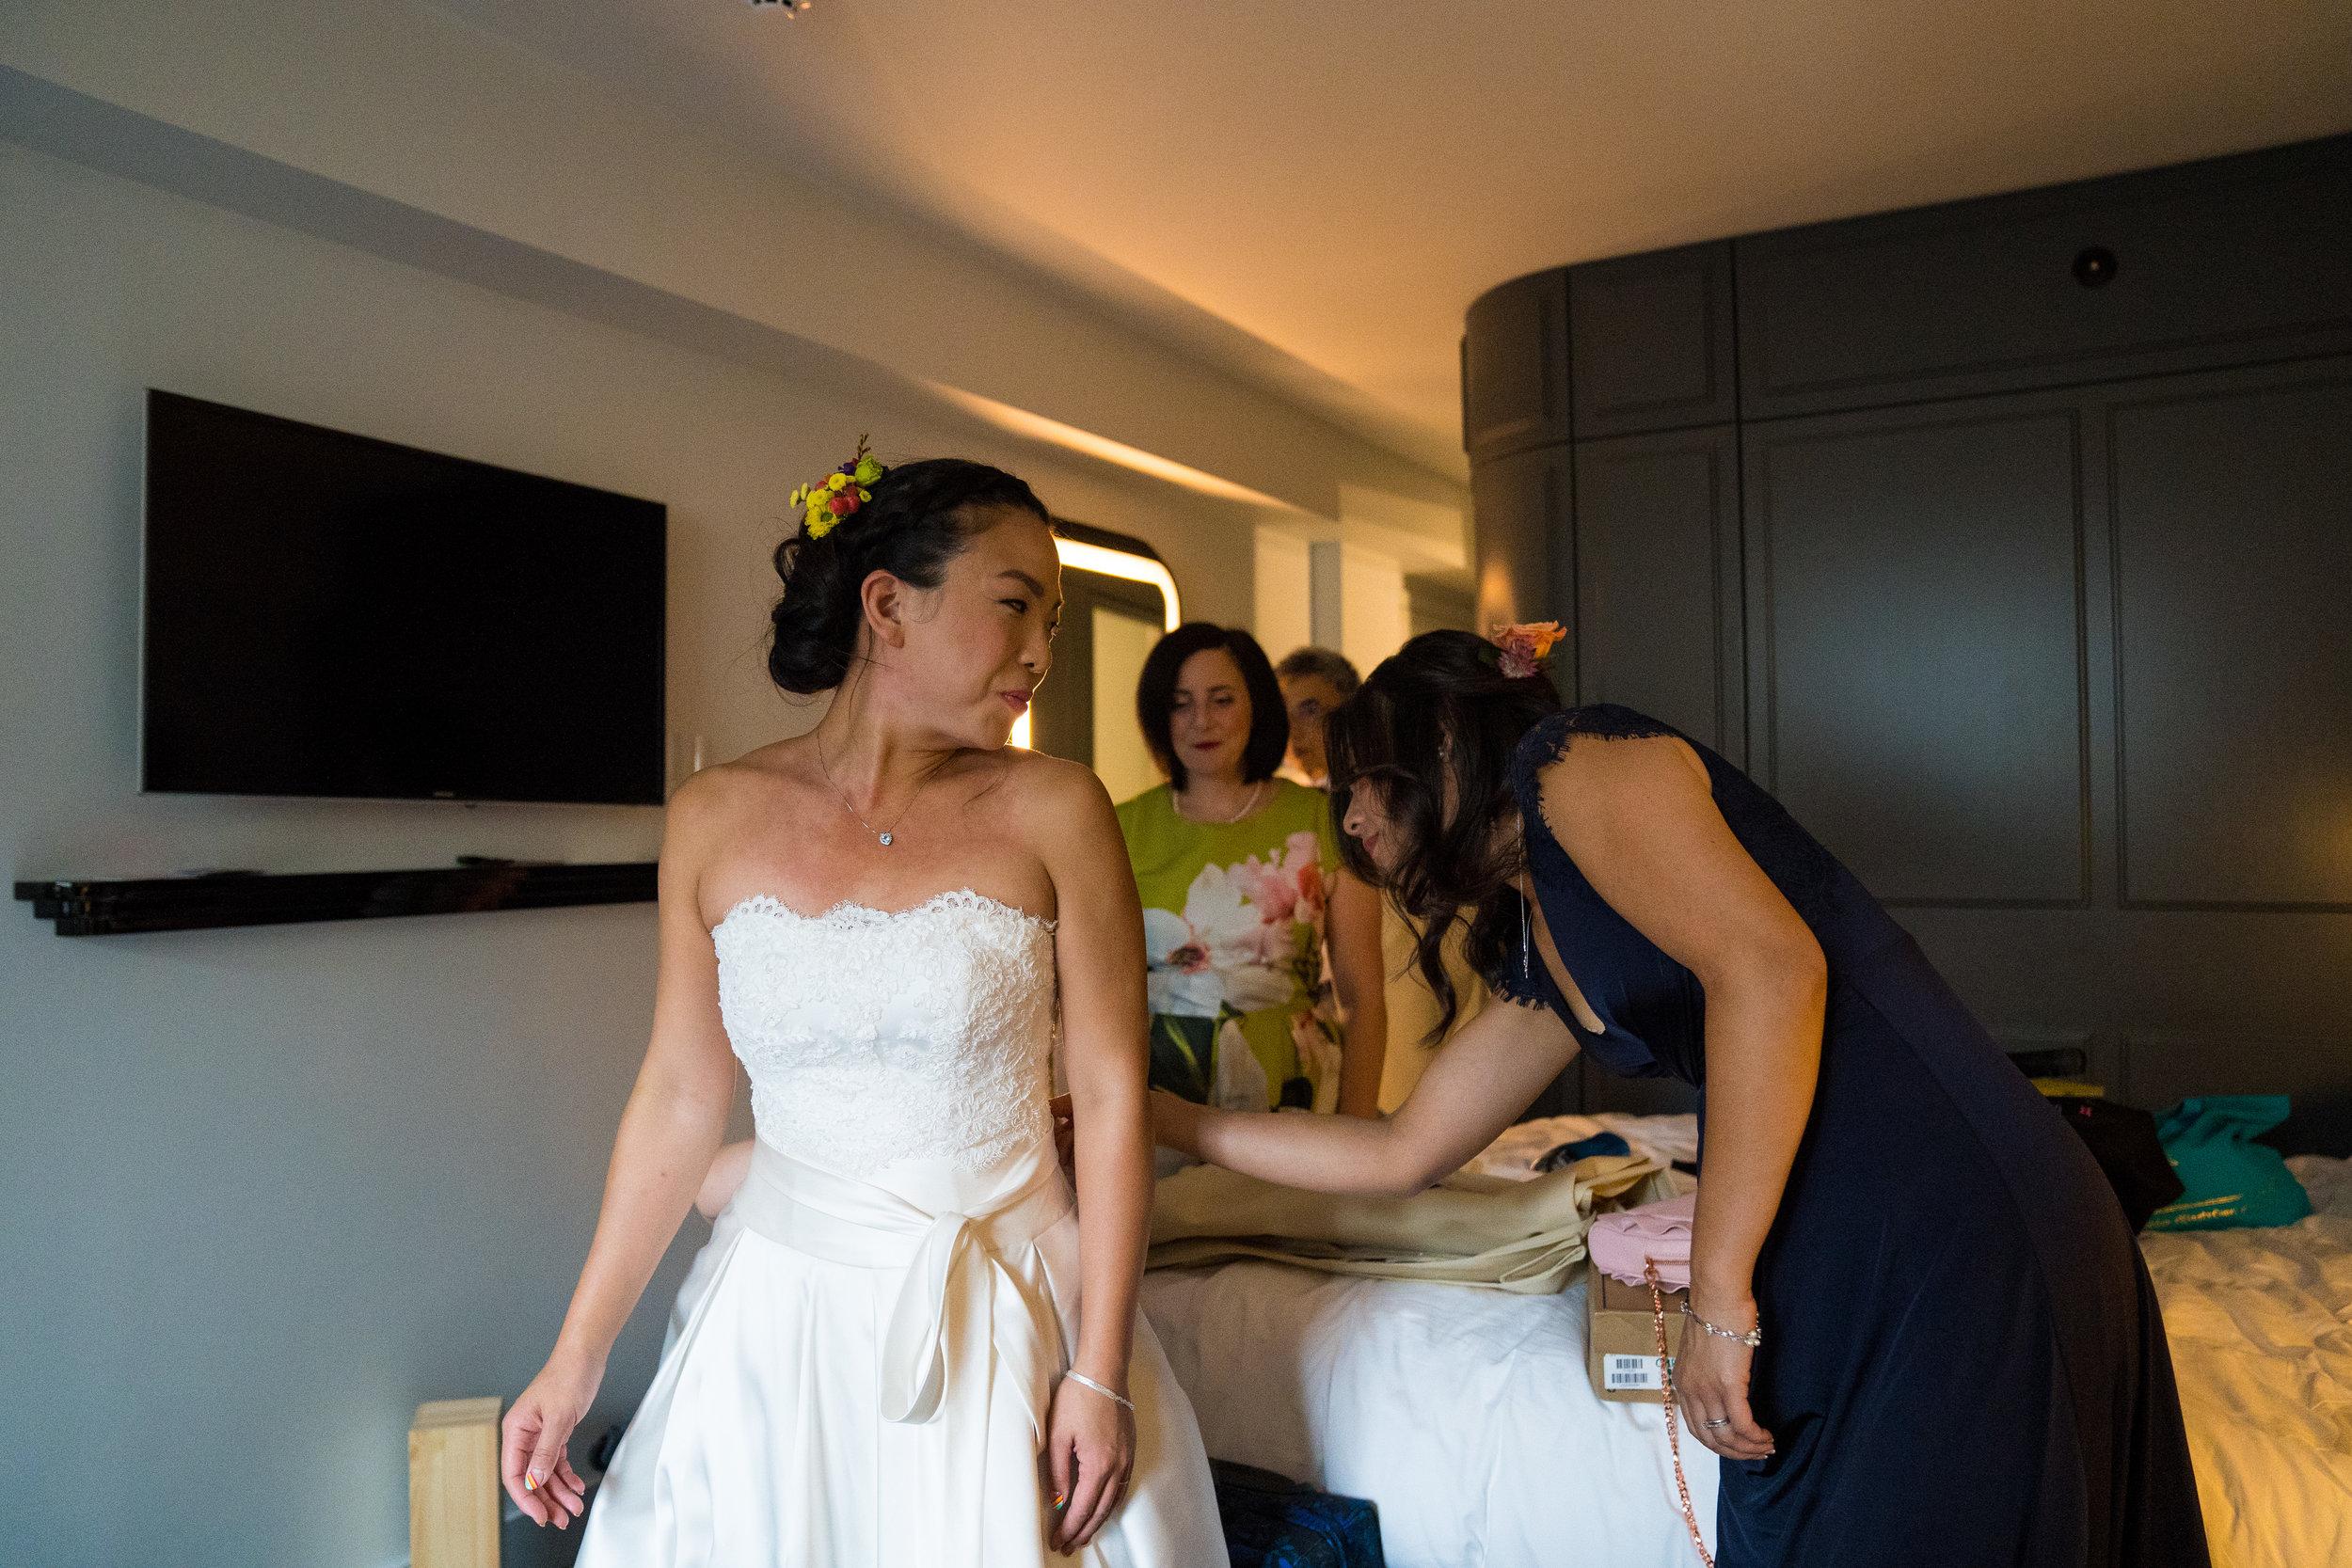 river-rooms-blackfriars-london-stpauls-mondrian-hotel-wedding-photography-videography-17